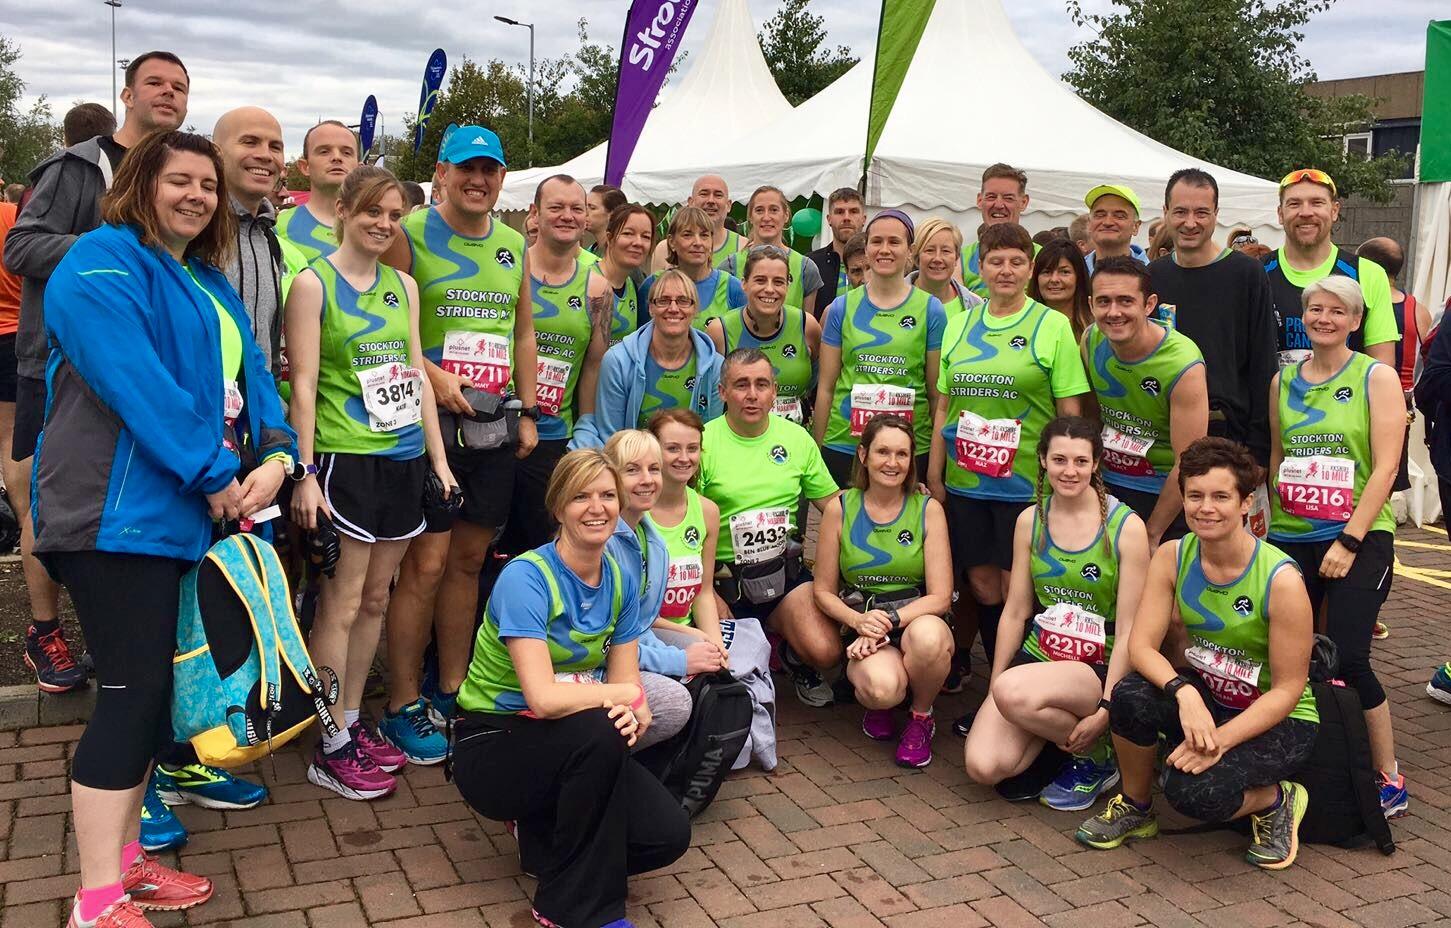 York Marathon and 10 mile